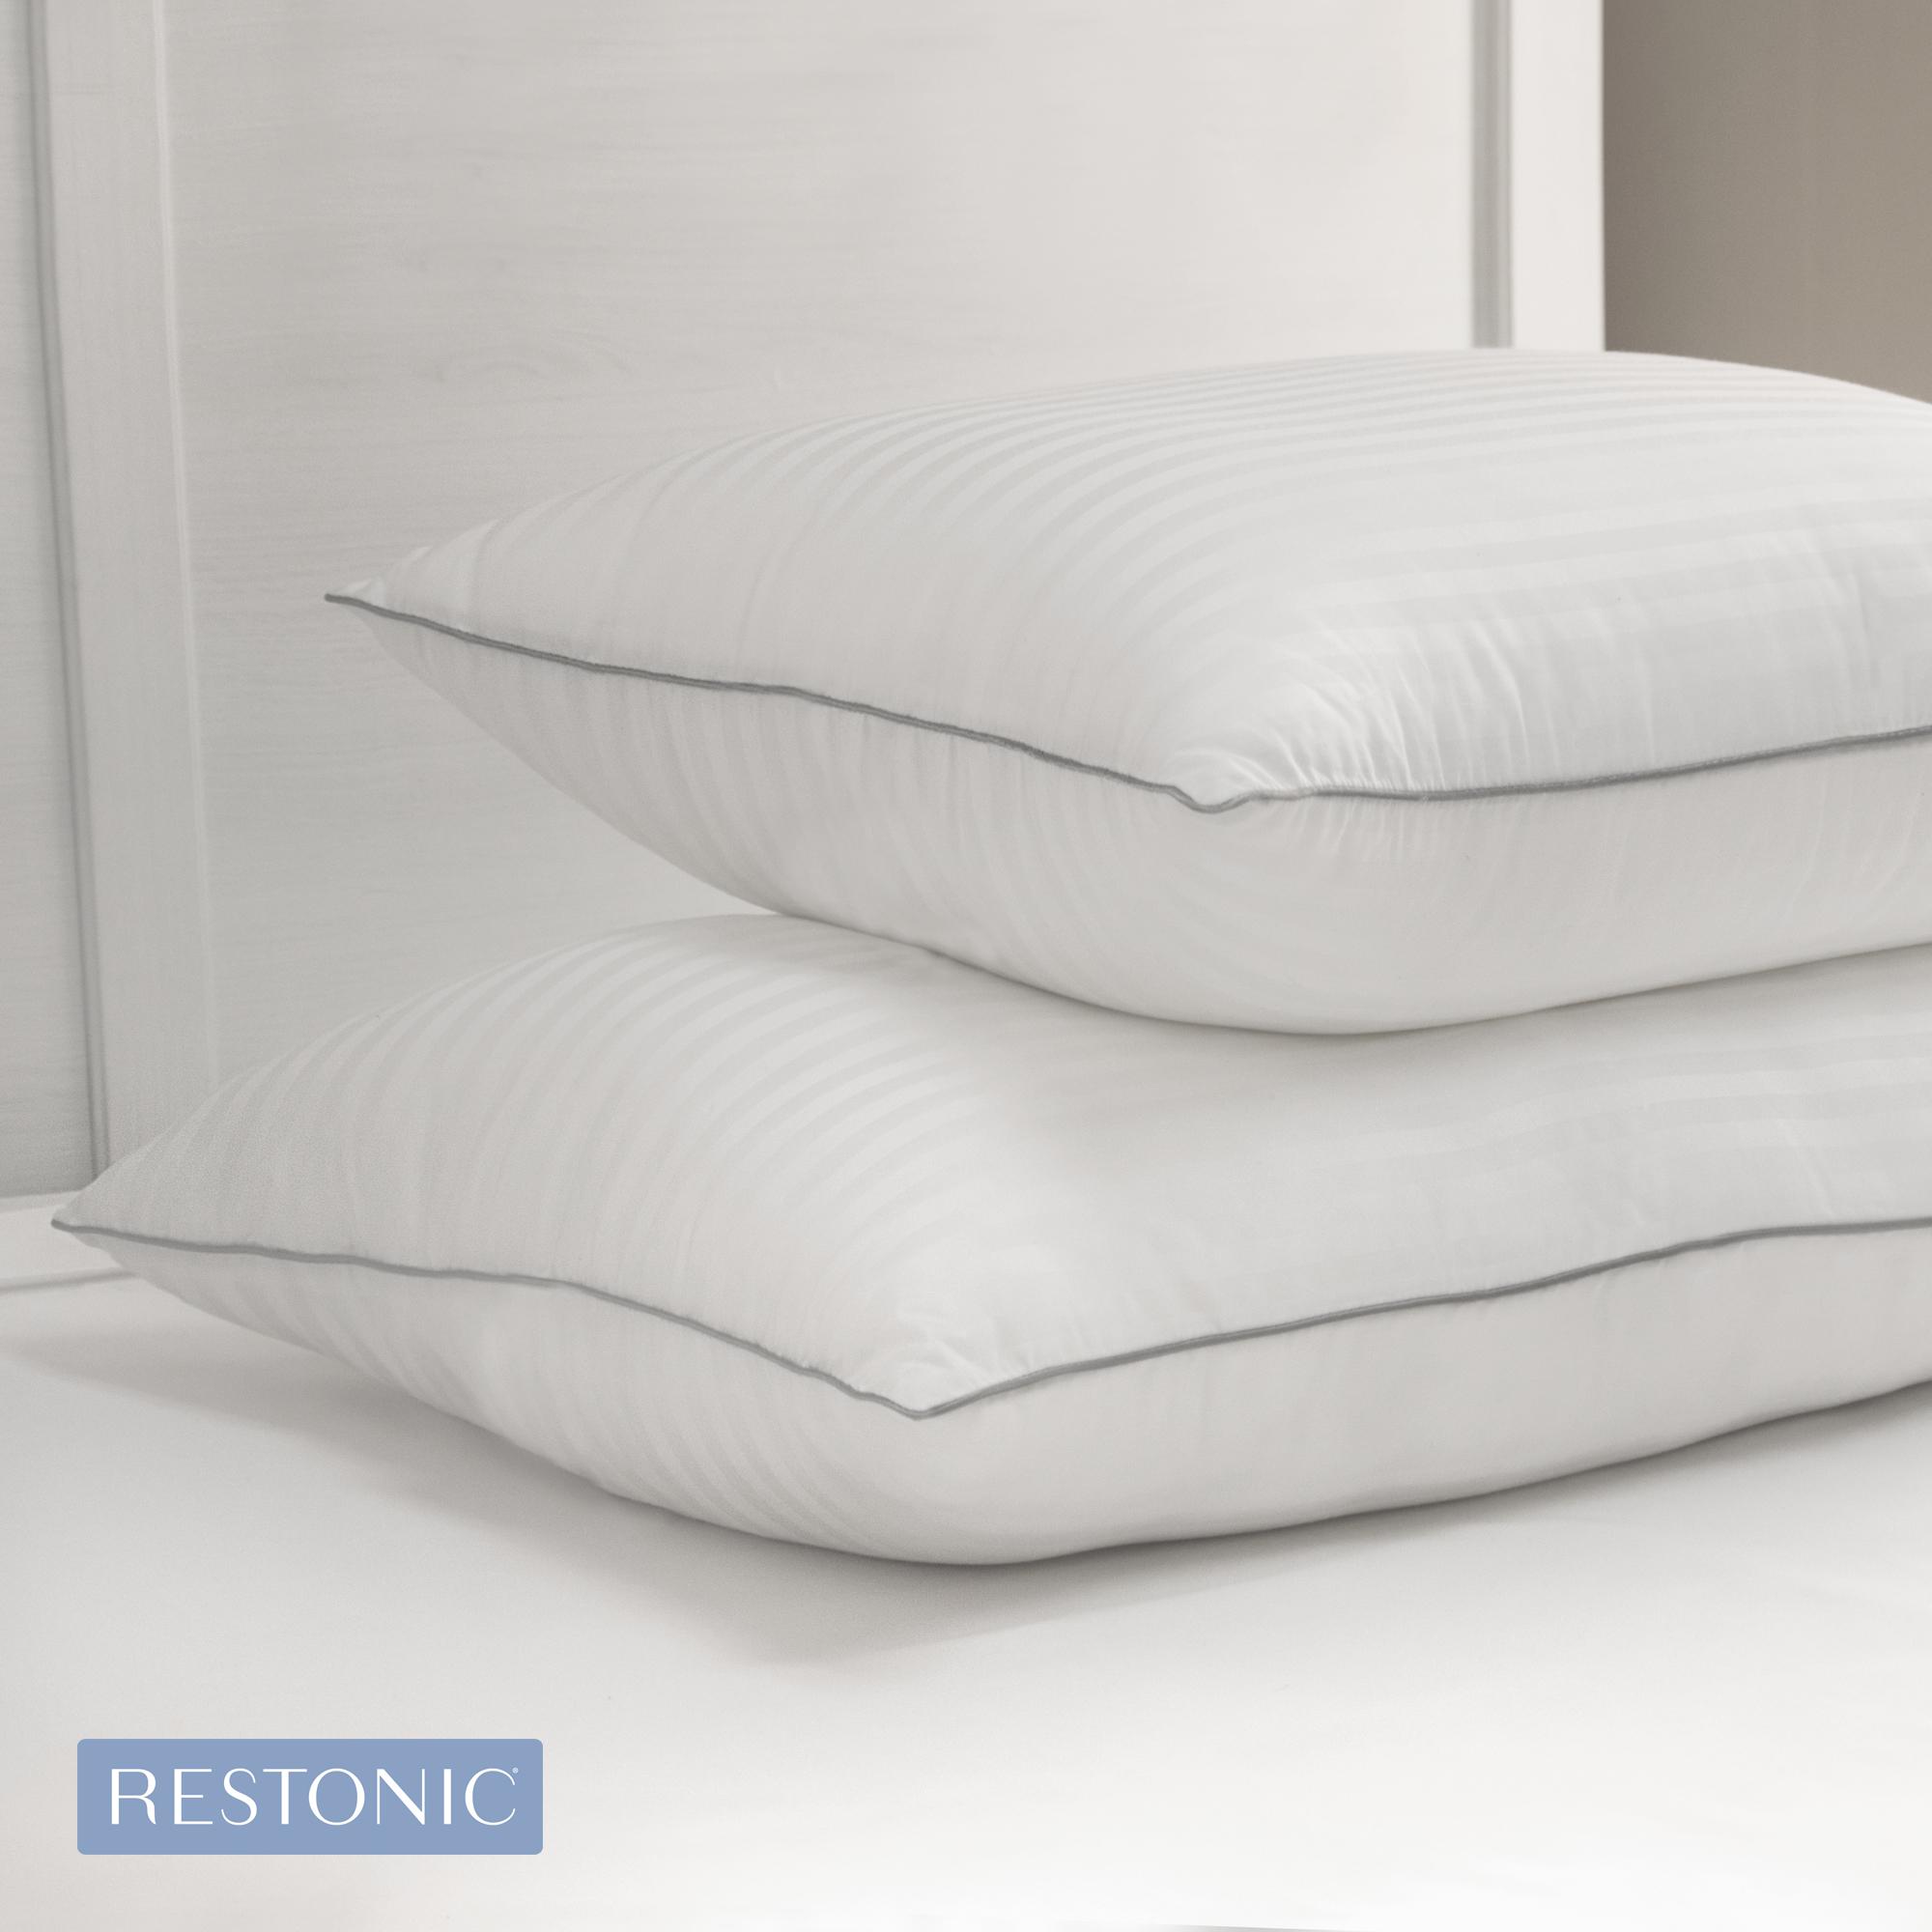 Sensorpedic Memory Fiber Pillow With 500 Thread Count